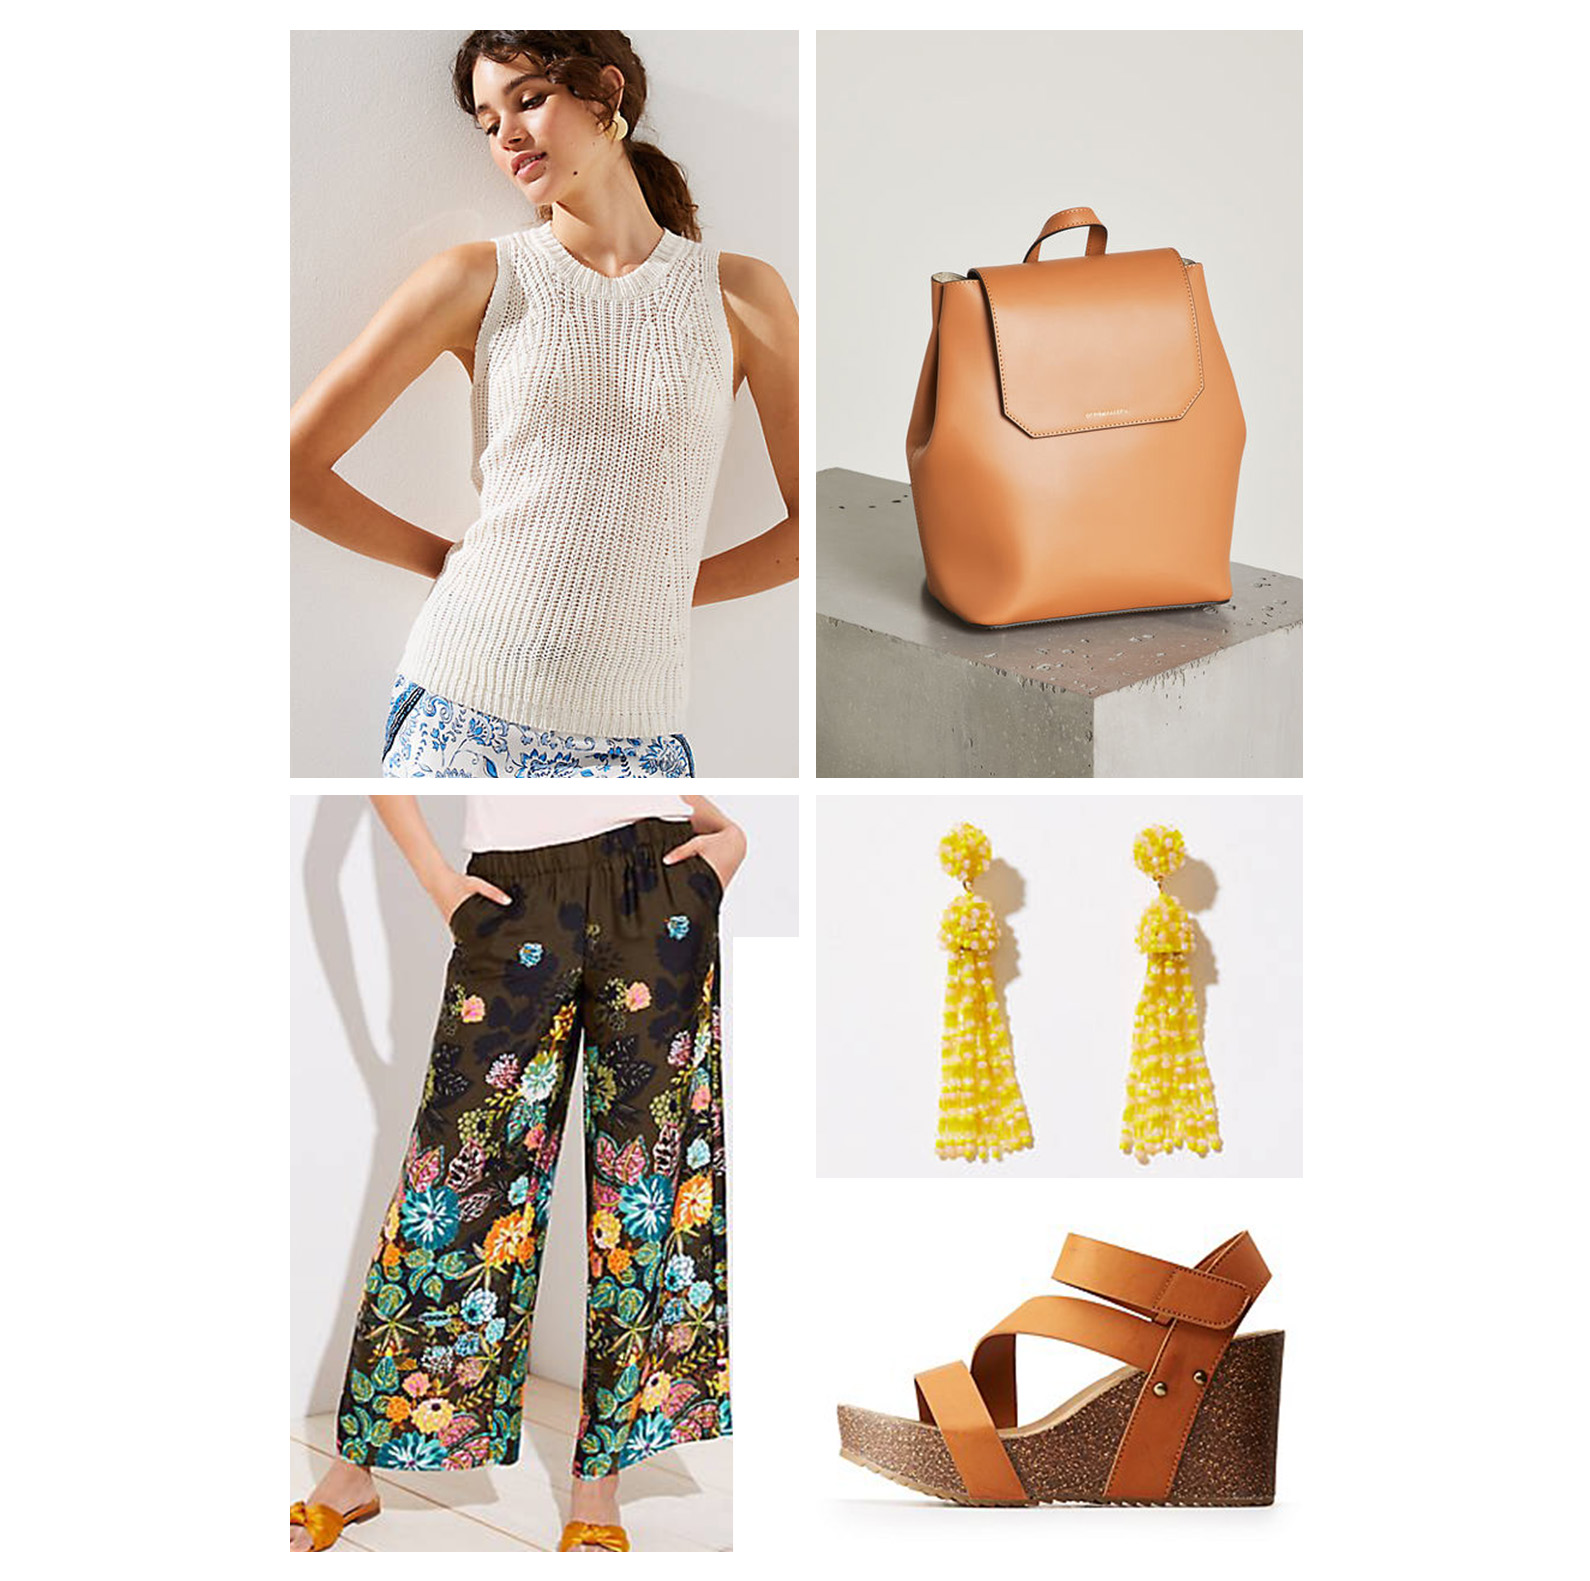 weekend-outfit-wideleg-pants-white-knit-sleeveless-sweater-wedge-sandals-yellow-earrings.jpg